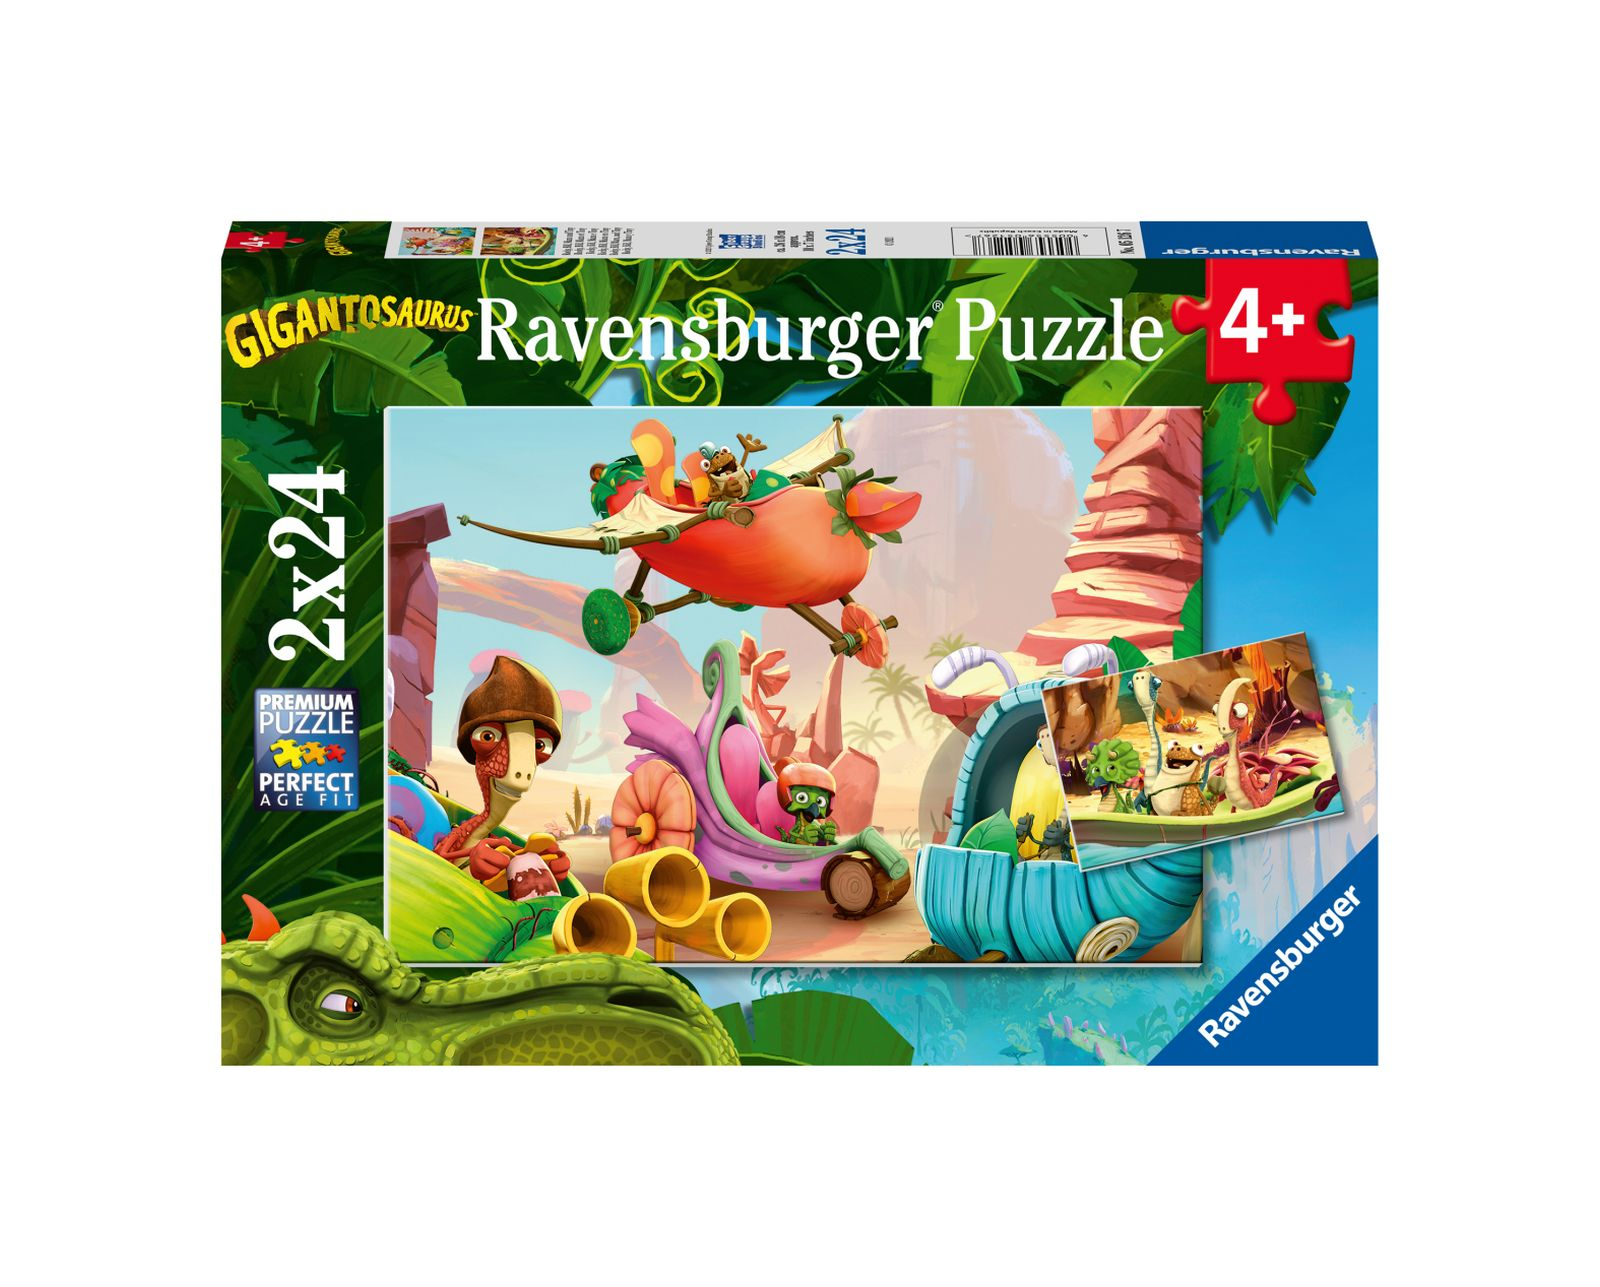 Ravensburger puzzle 2x24 pezzi gigantosaurus - Ravensburger1